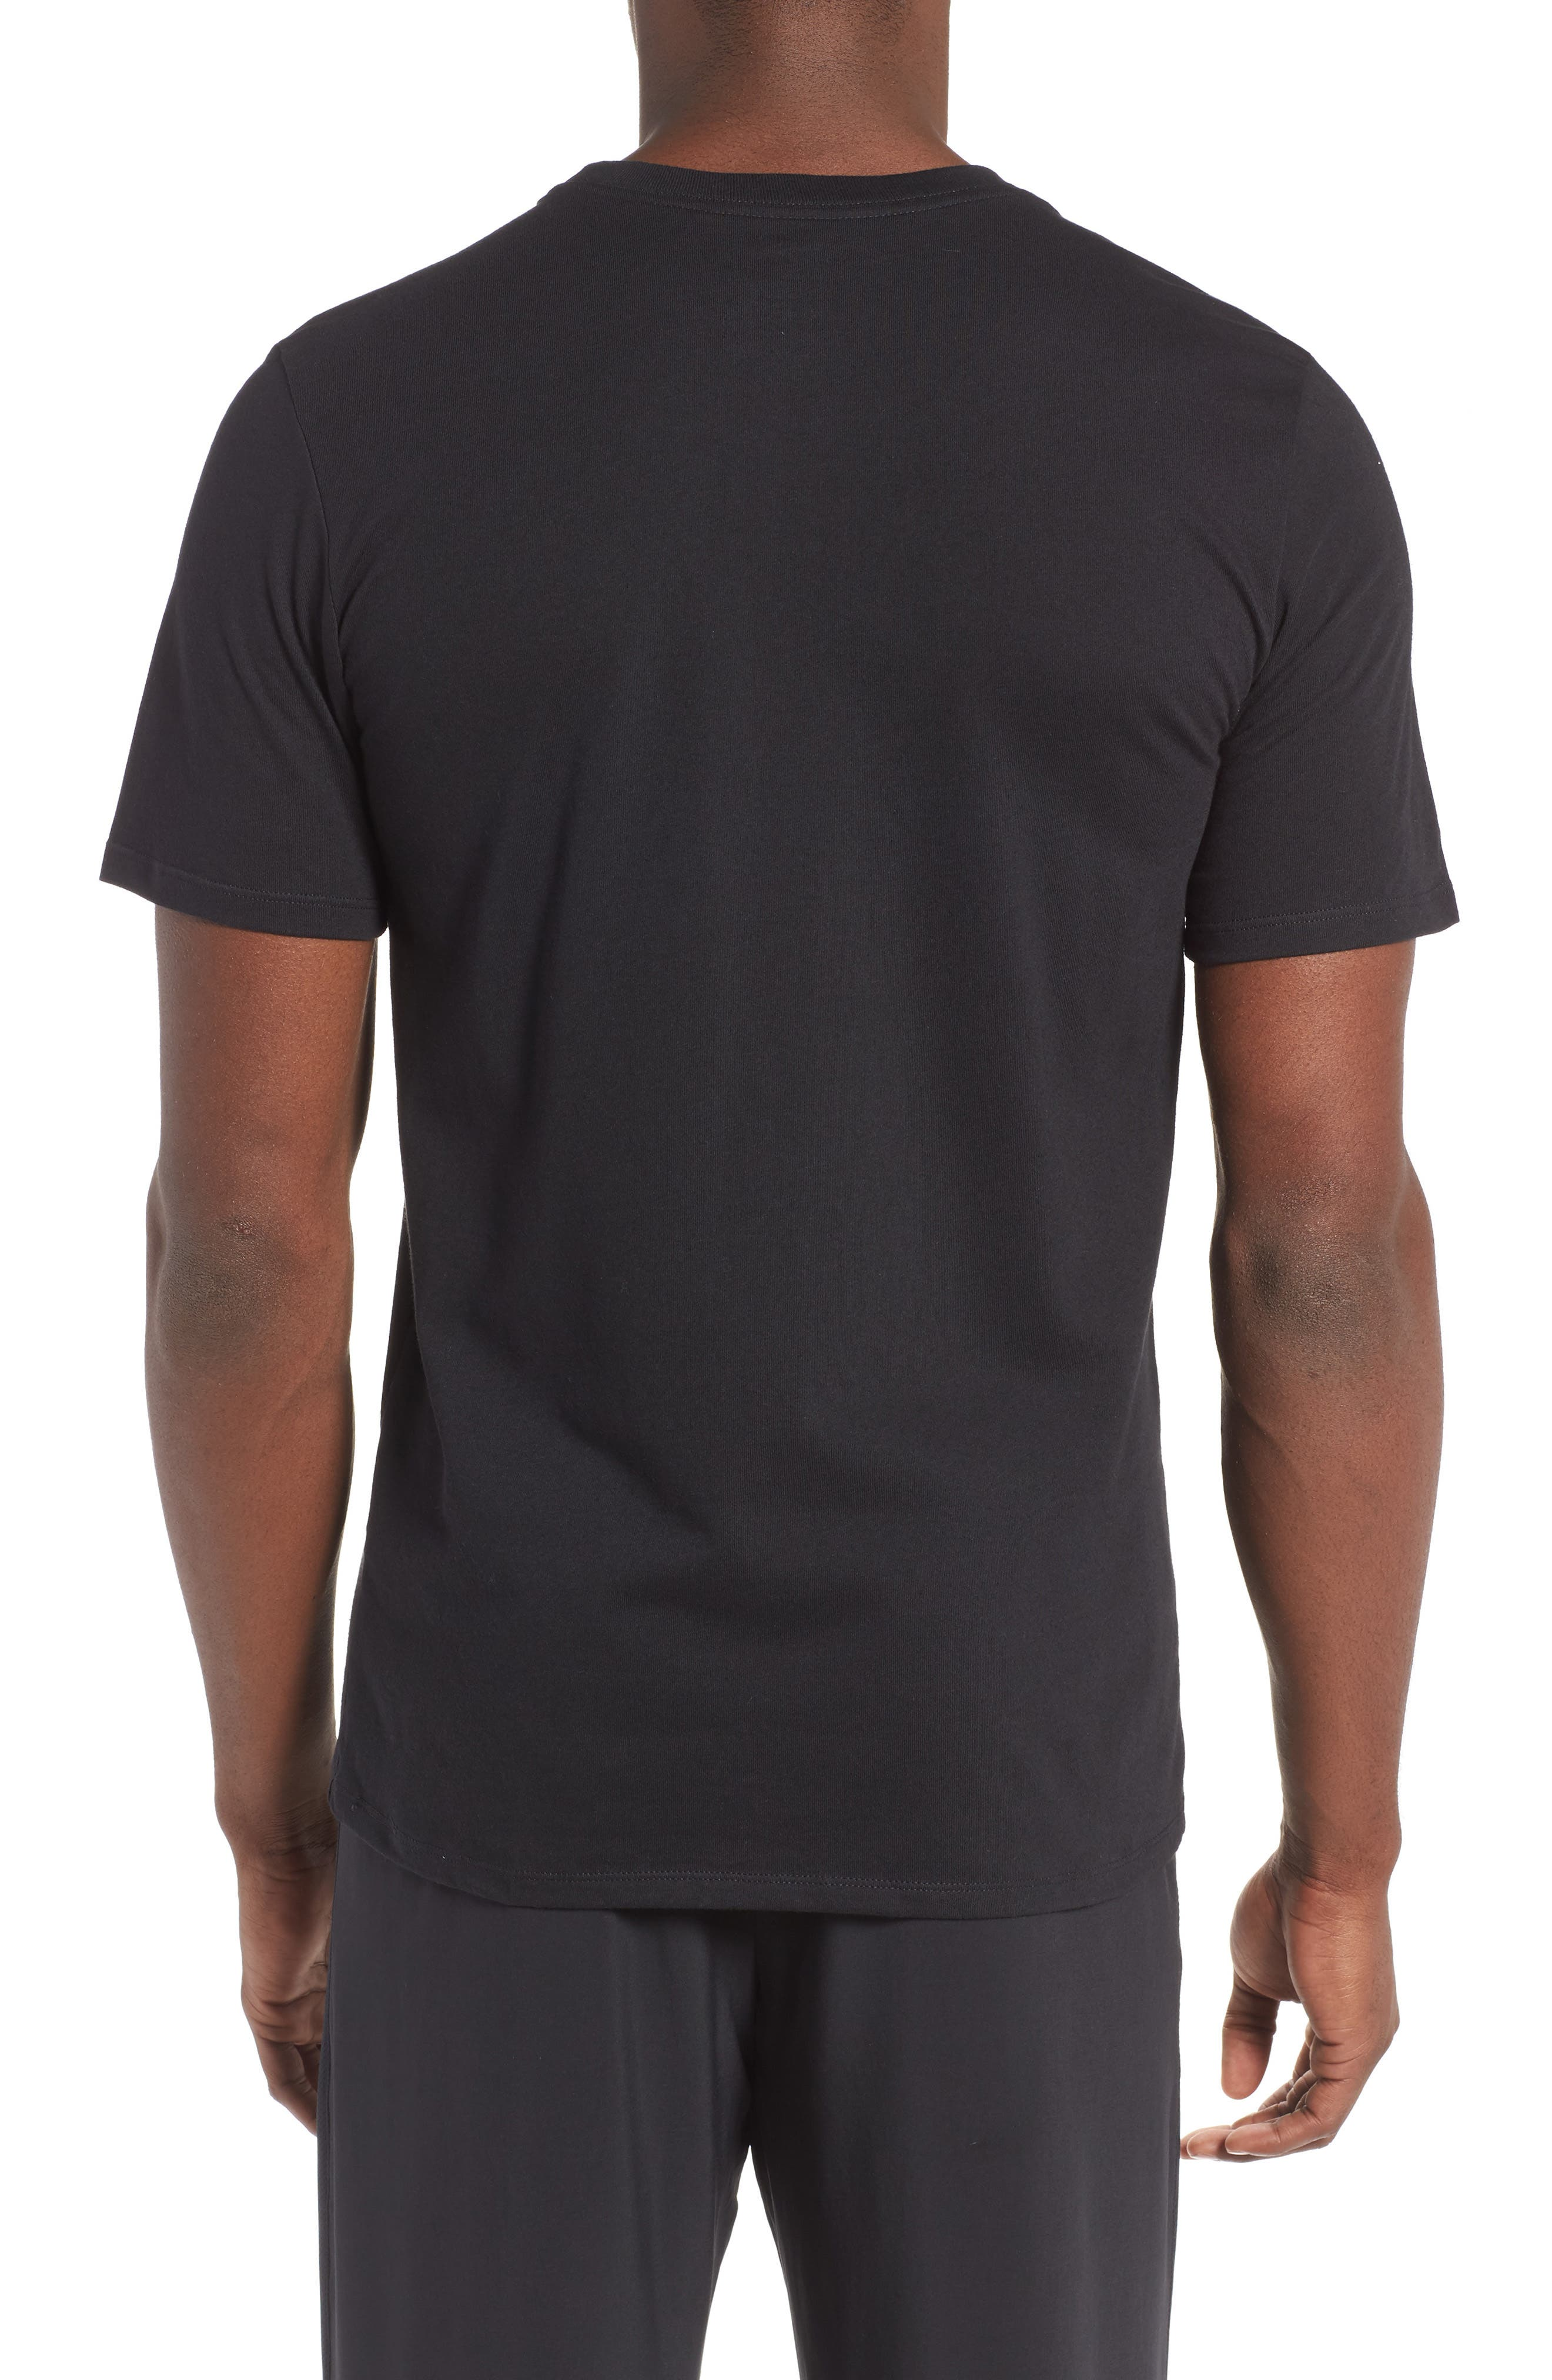 Just Buckets T-Shirt,                             Alternate thumbnail 2, color,                             010